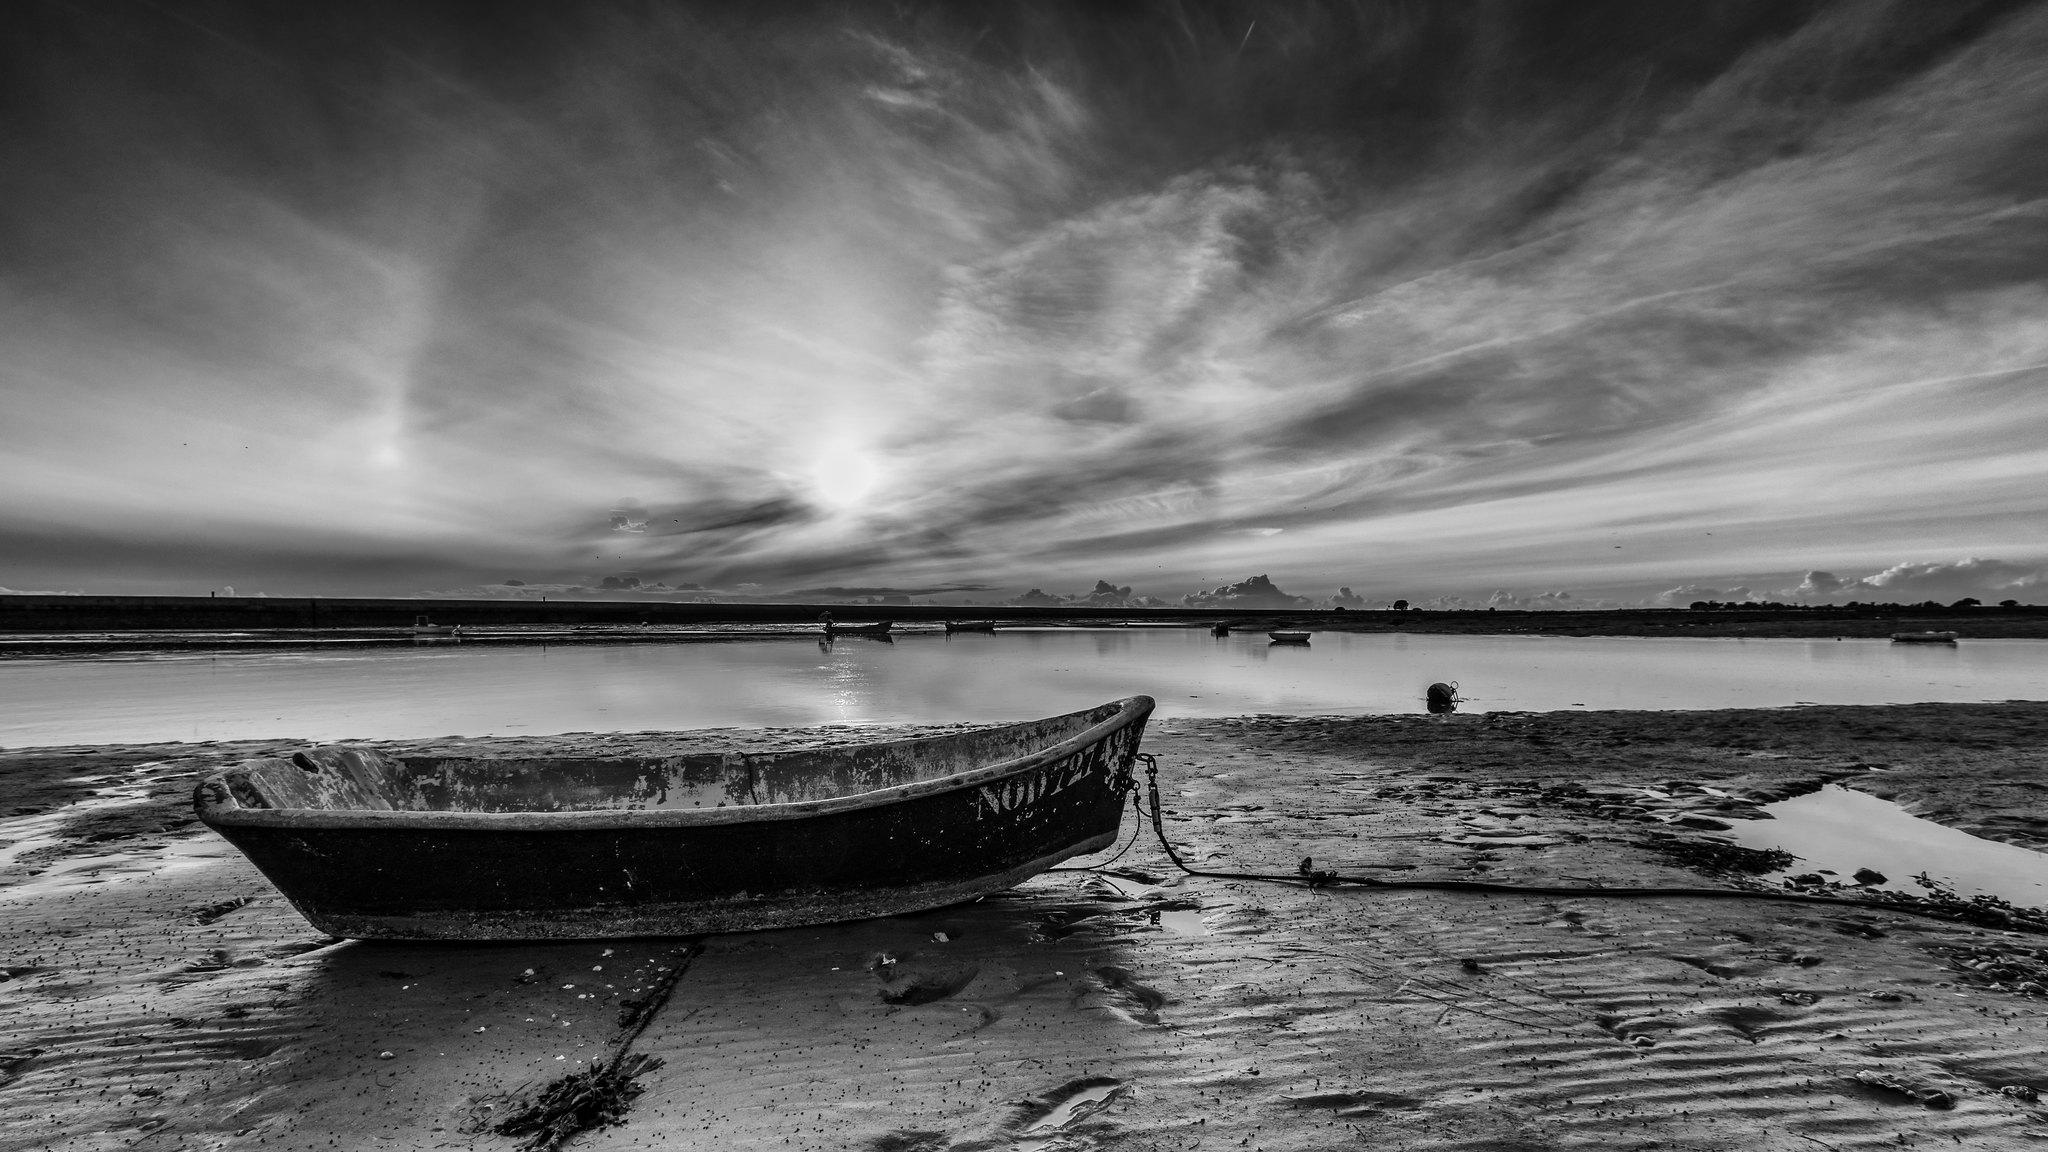 Barque abandonnée.  39847714742_b645a1577b_k